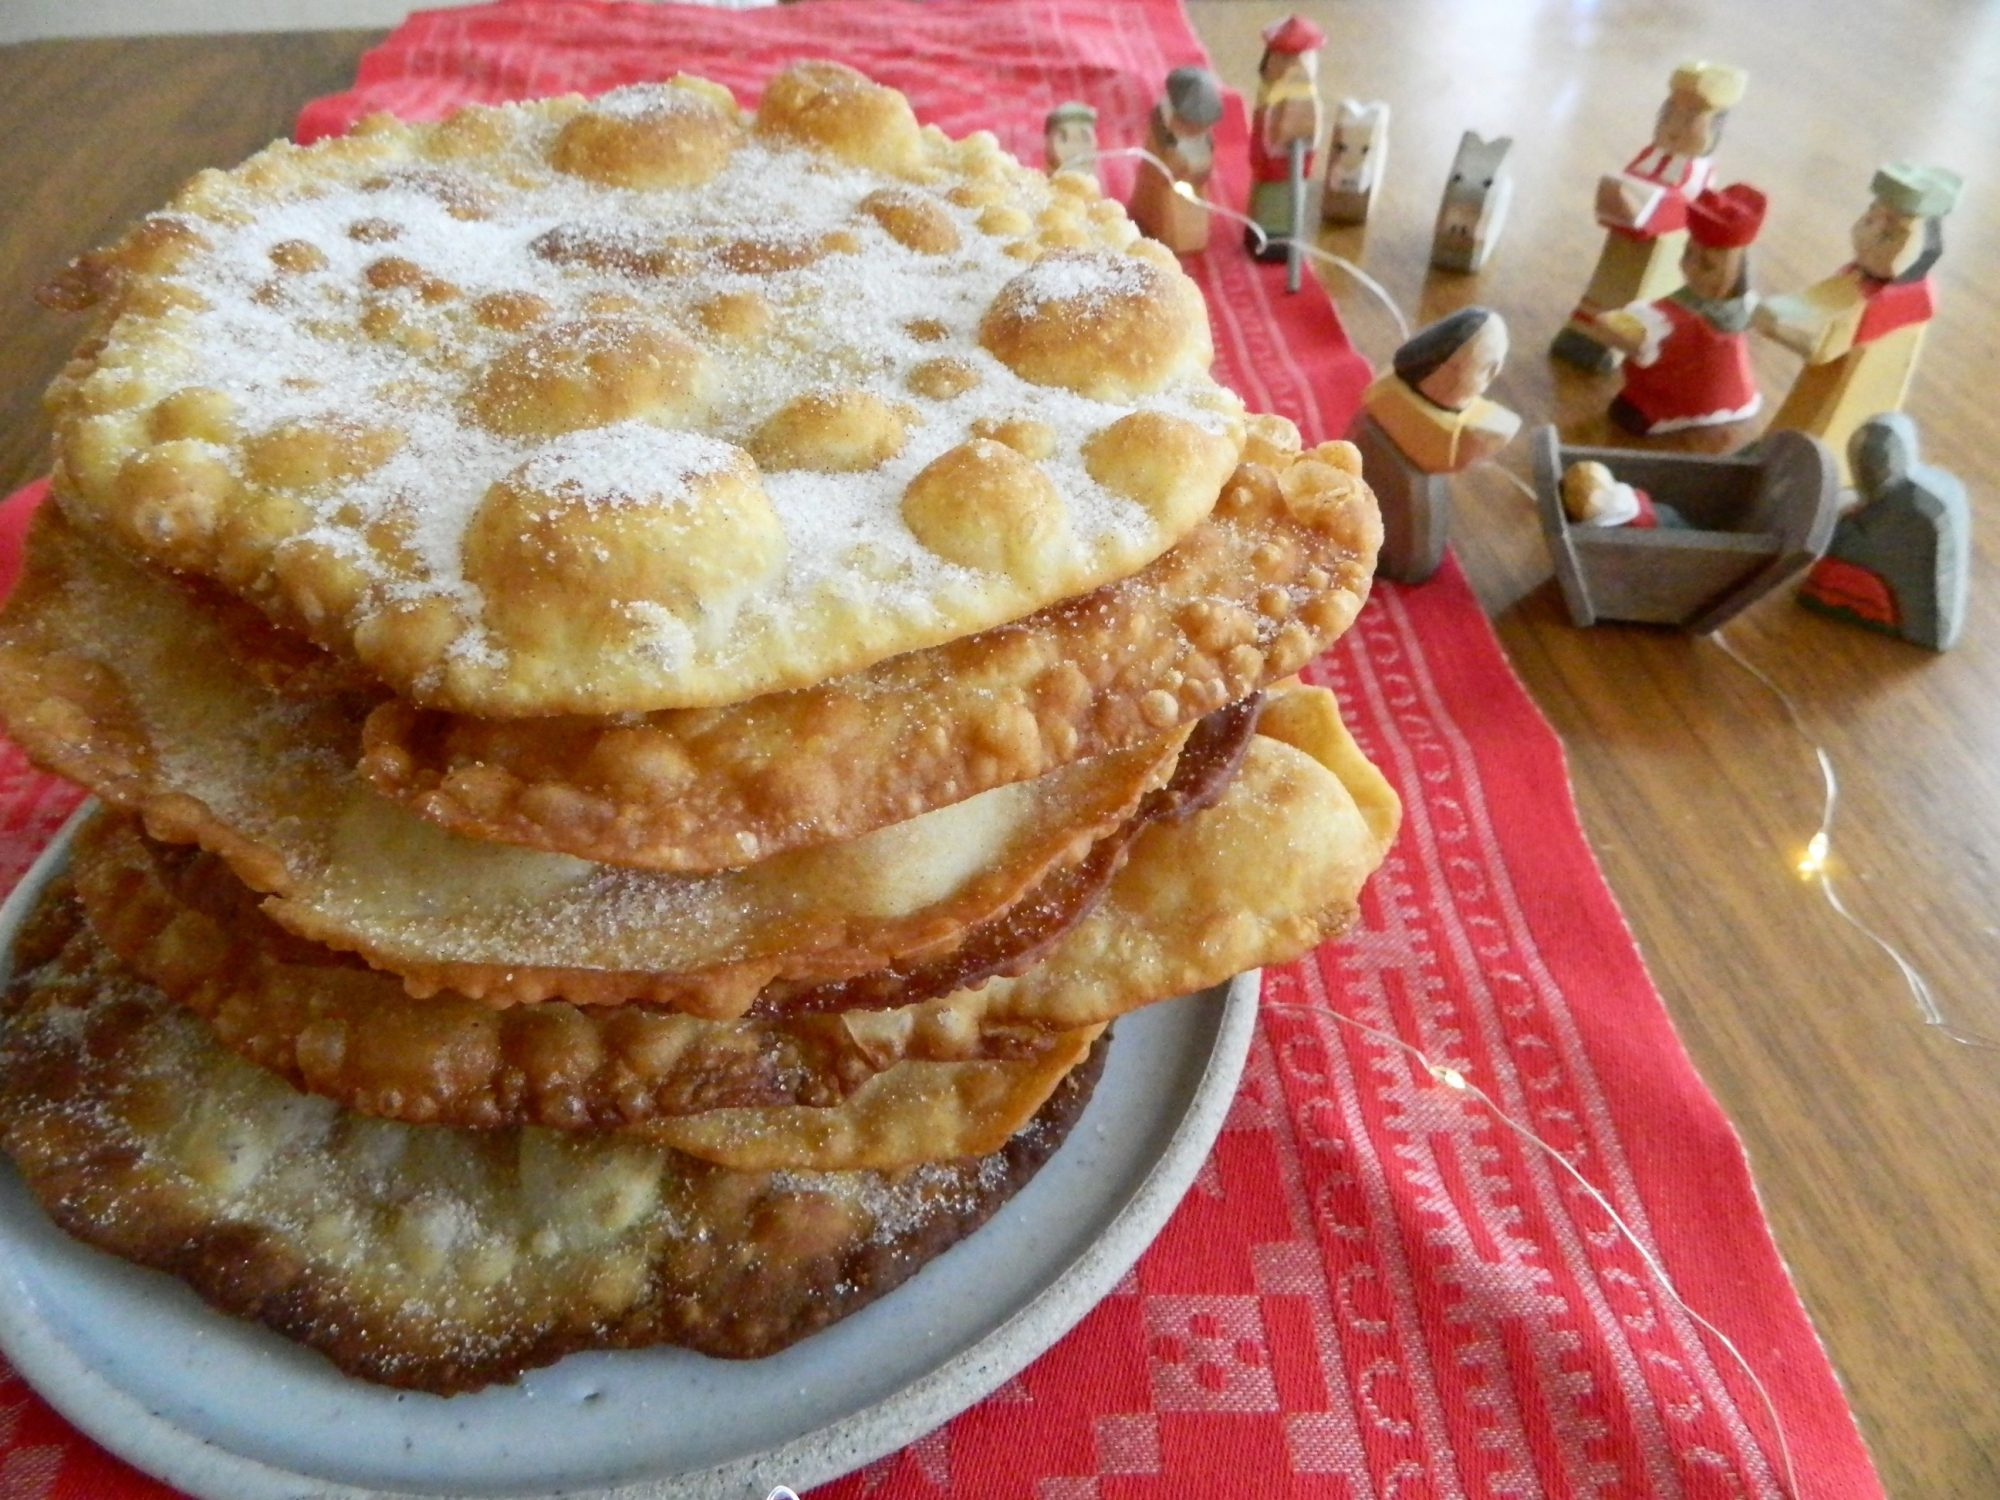 Bunuelos sweet fried tortillas with cinnamon sugar topping